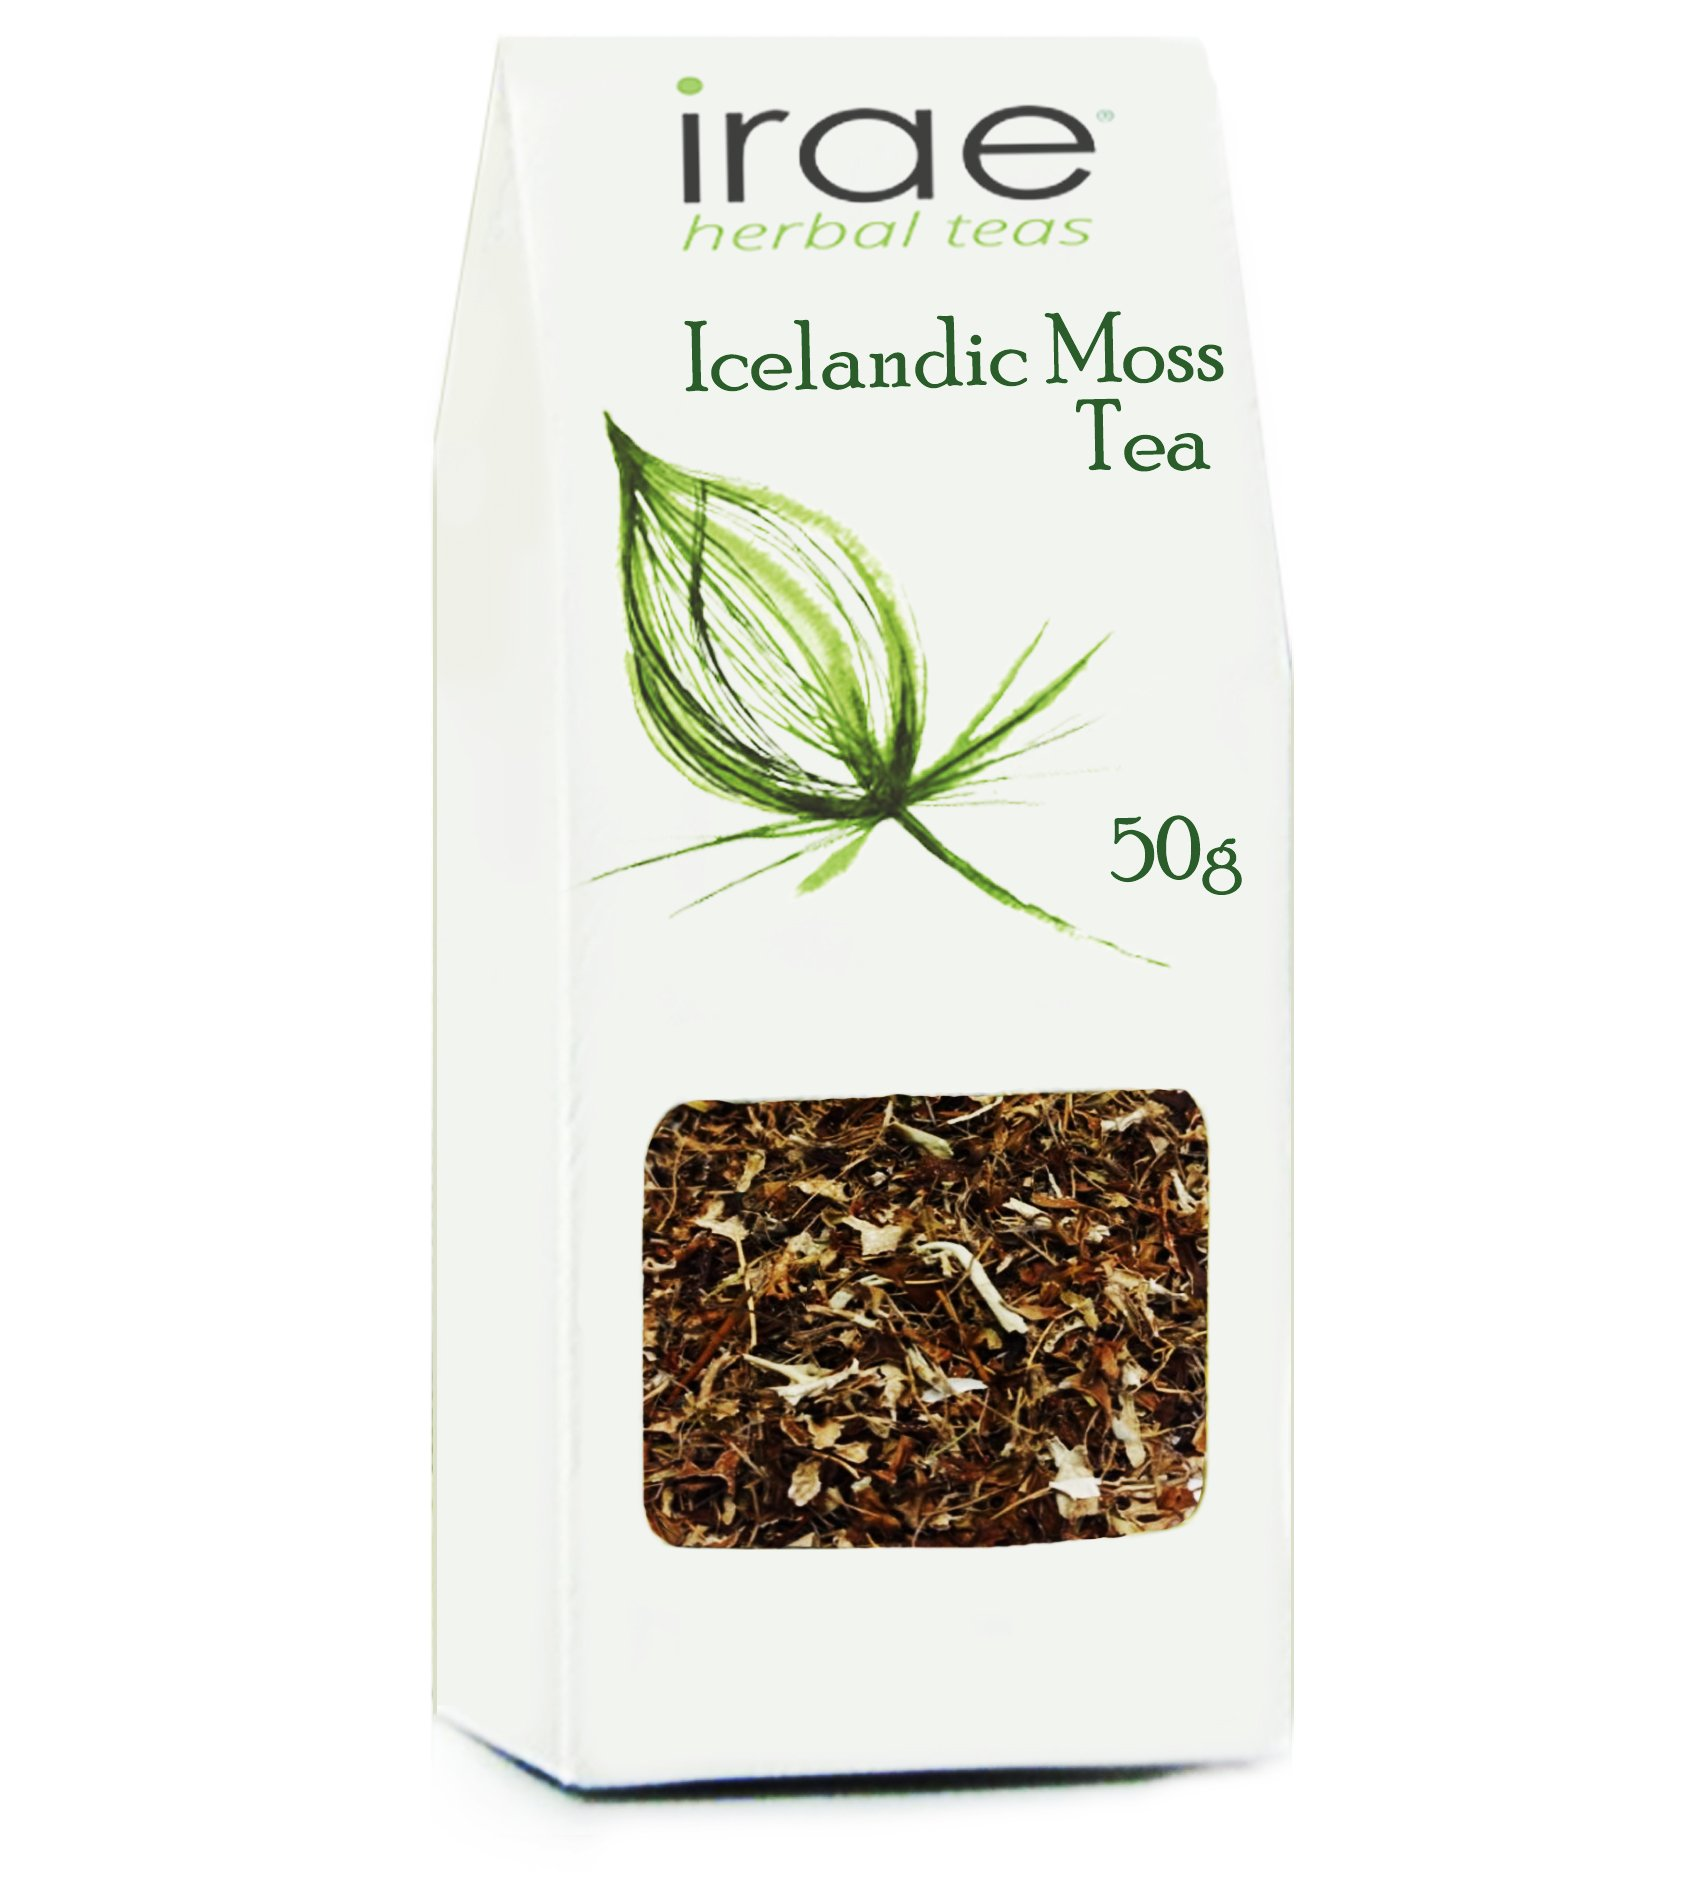 Icelandic Moss Pure Herbal Tea 50g